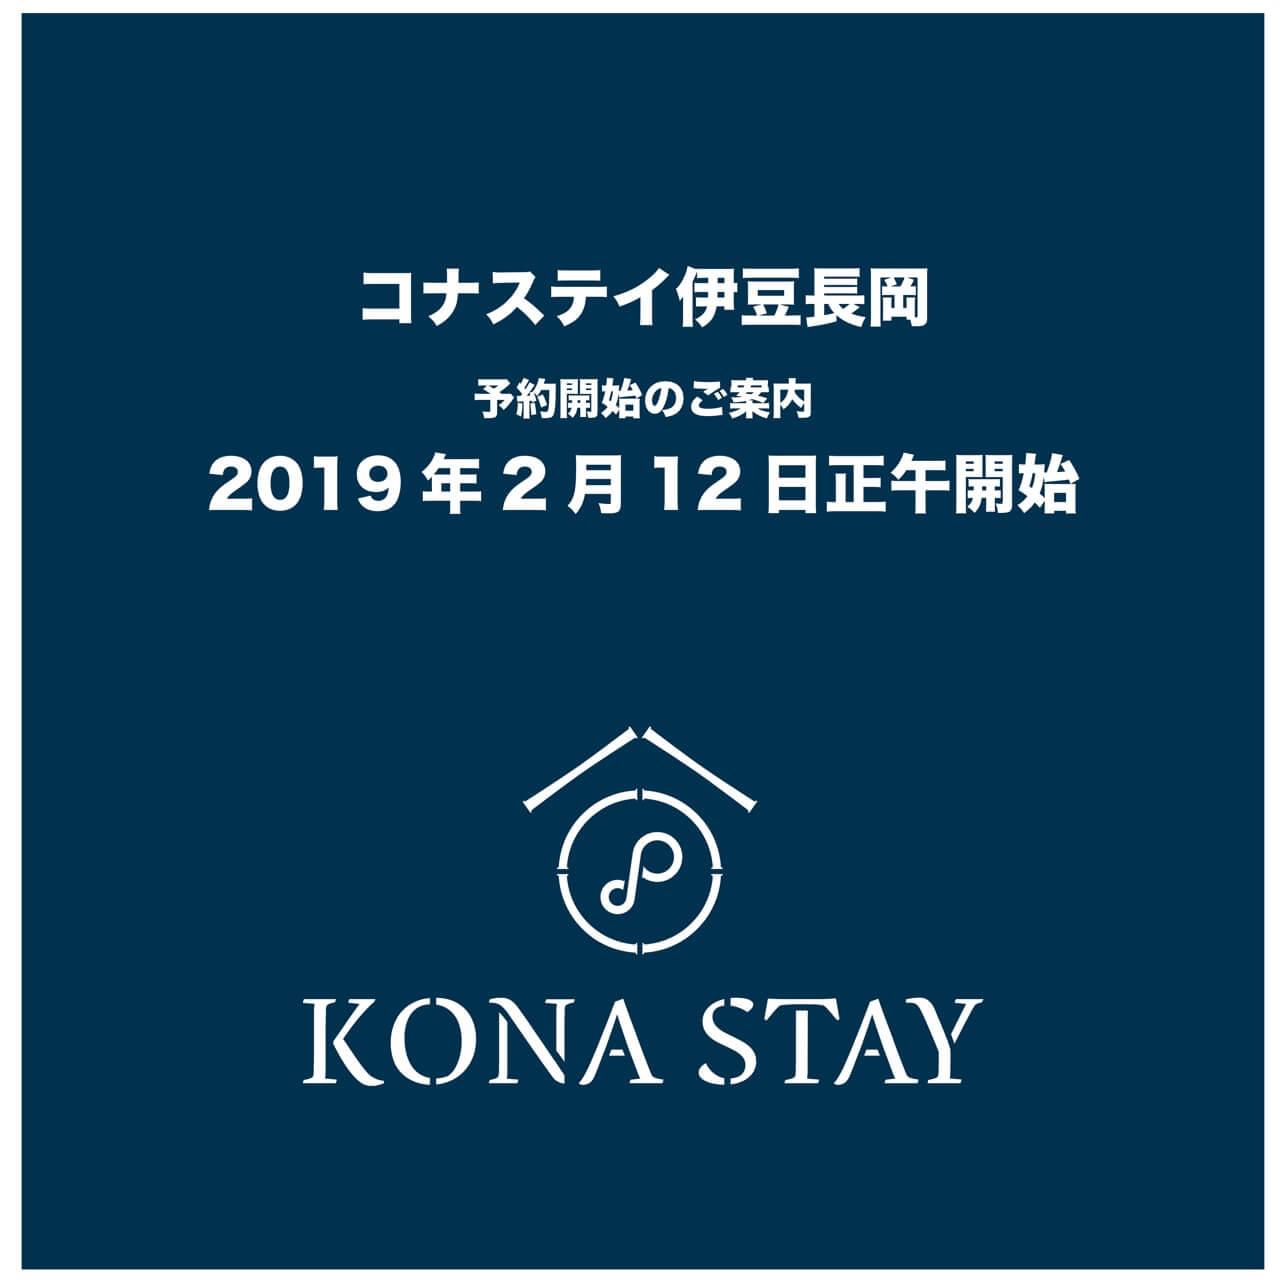 KONA STAY2019年2月12日予約スタート